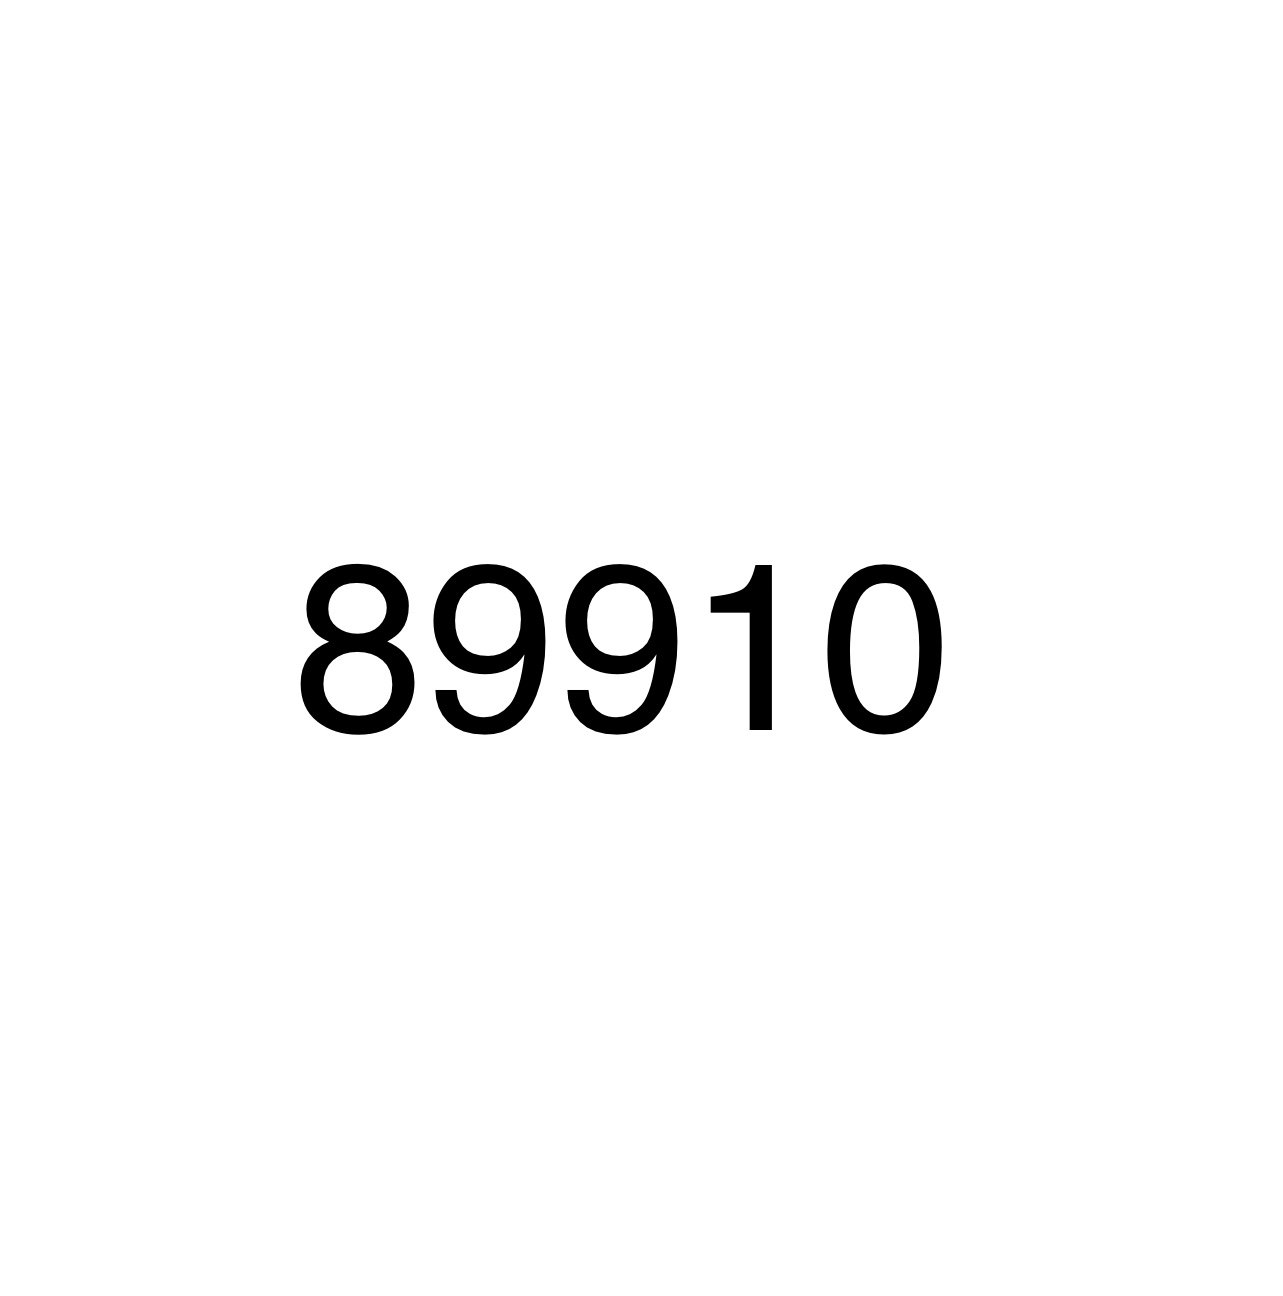 89910